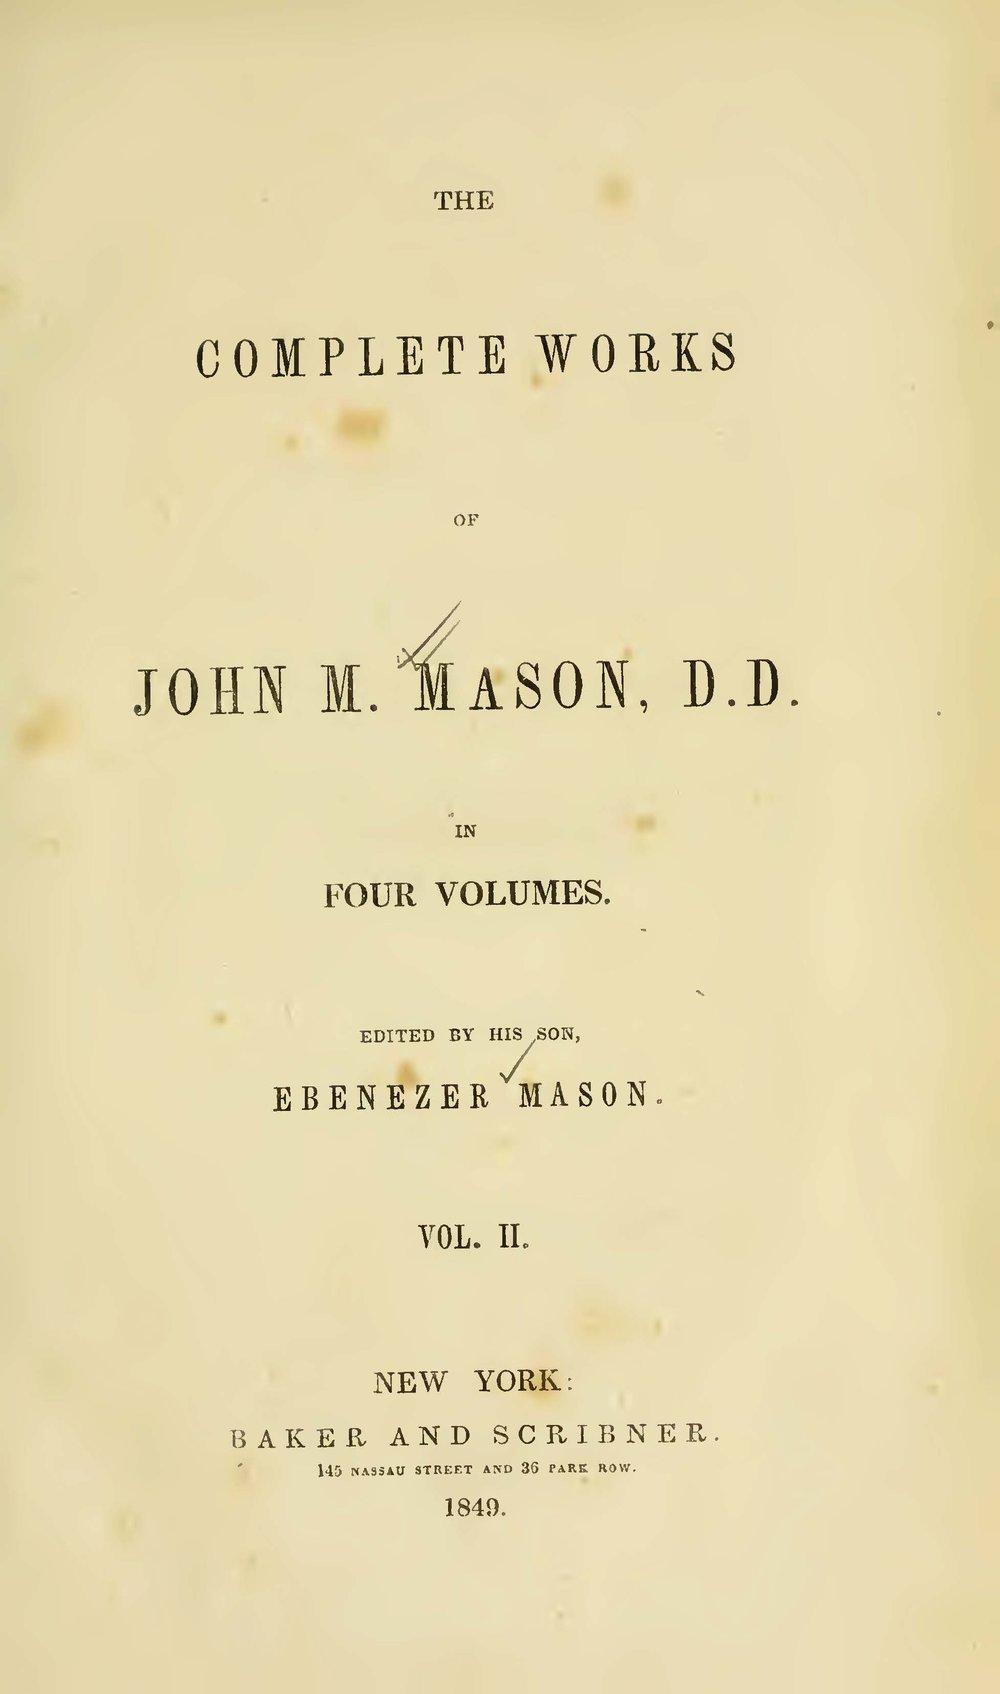 Mason, John Mitchell, The Complete Works of John M. Mason, D.D., Vol. 2 Title Page.jpg